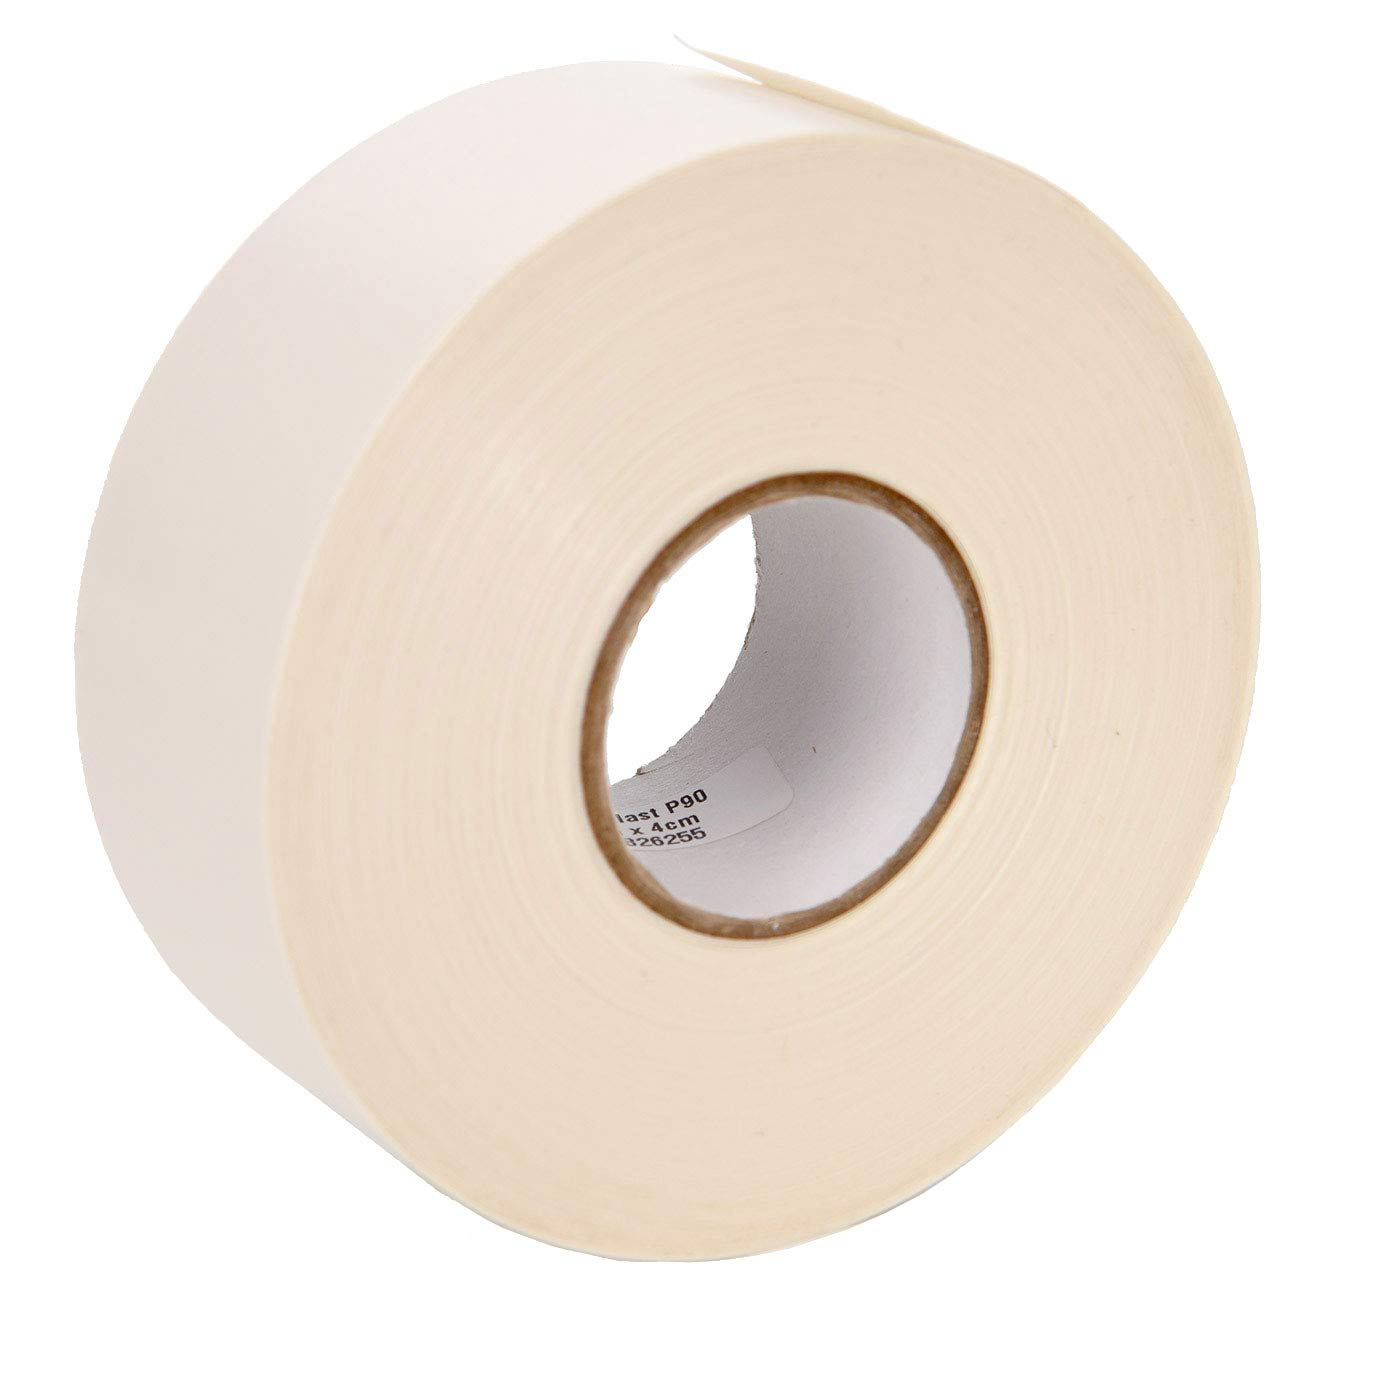 Neschen Filmoplast P90 White Paper Archival Mending Tape, 1.5 in. (4 cm) x 165 ft, Single Roll by Neschen